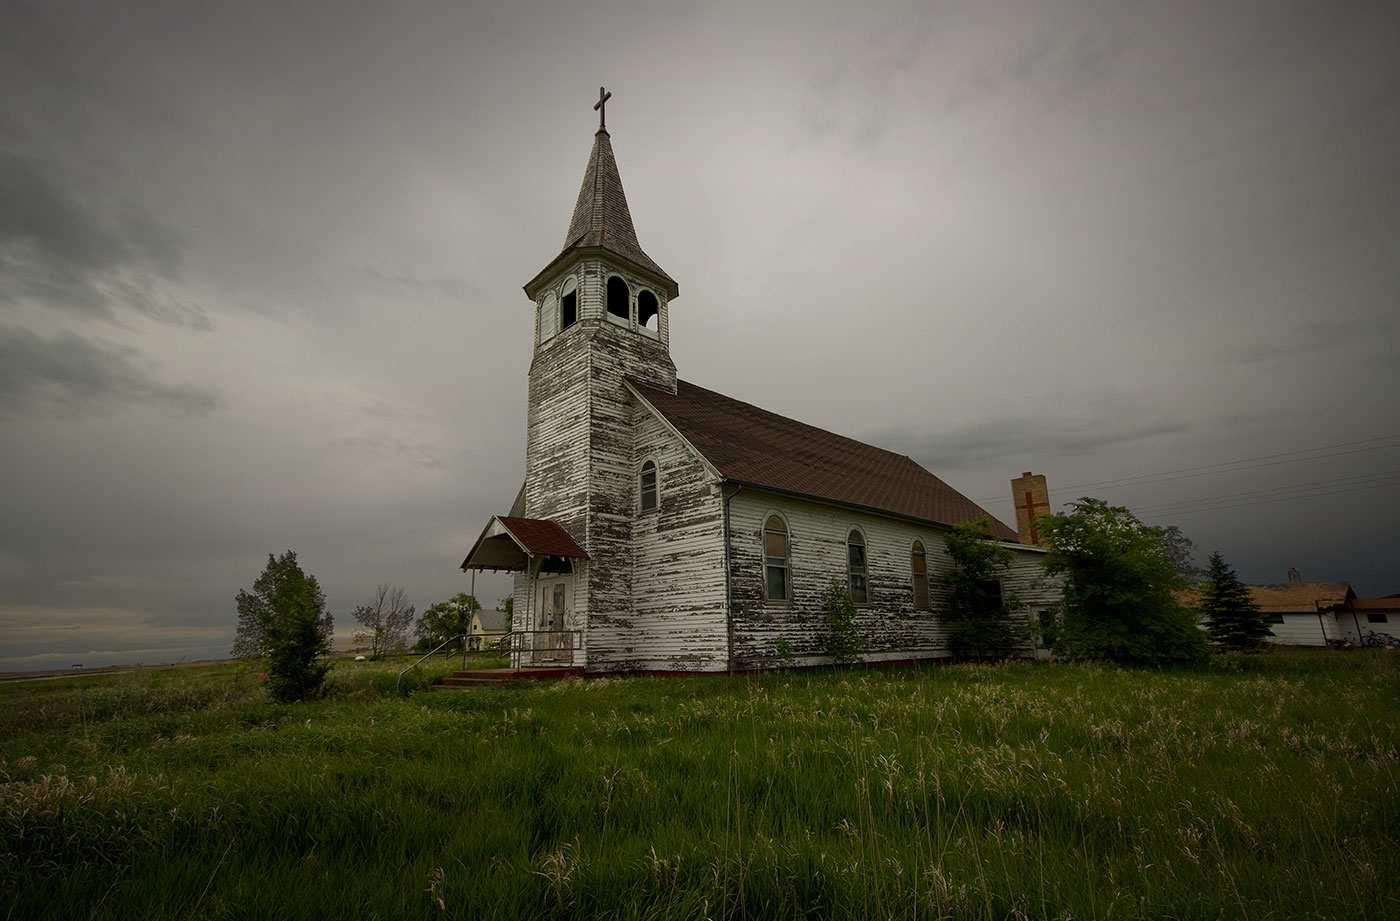 Balfour, North Dakota